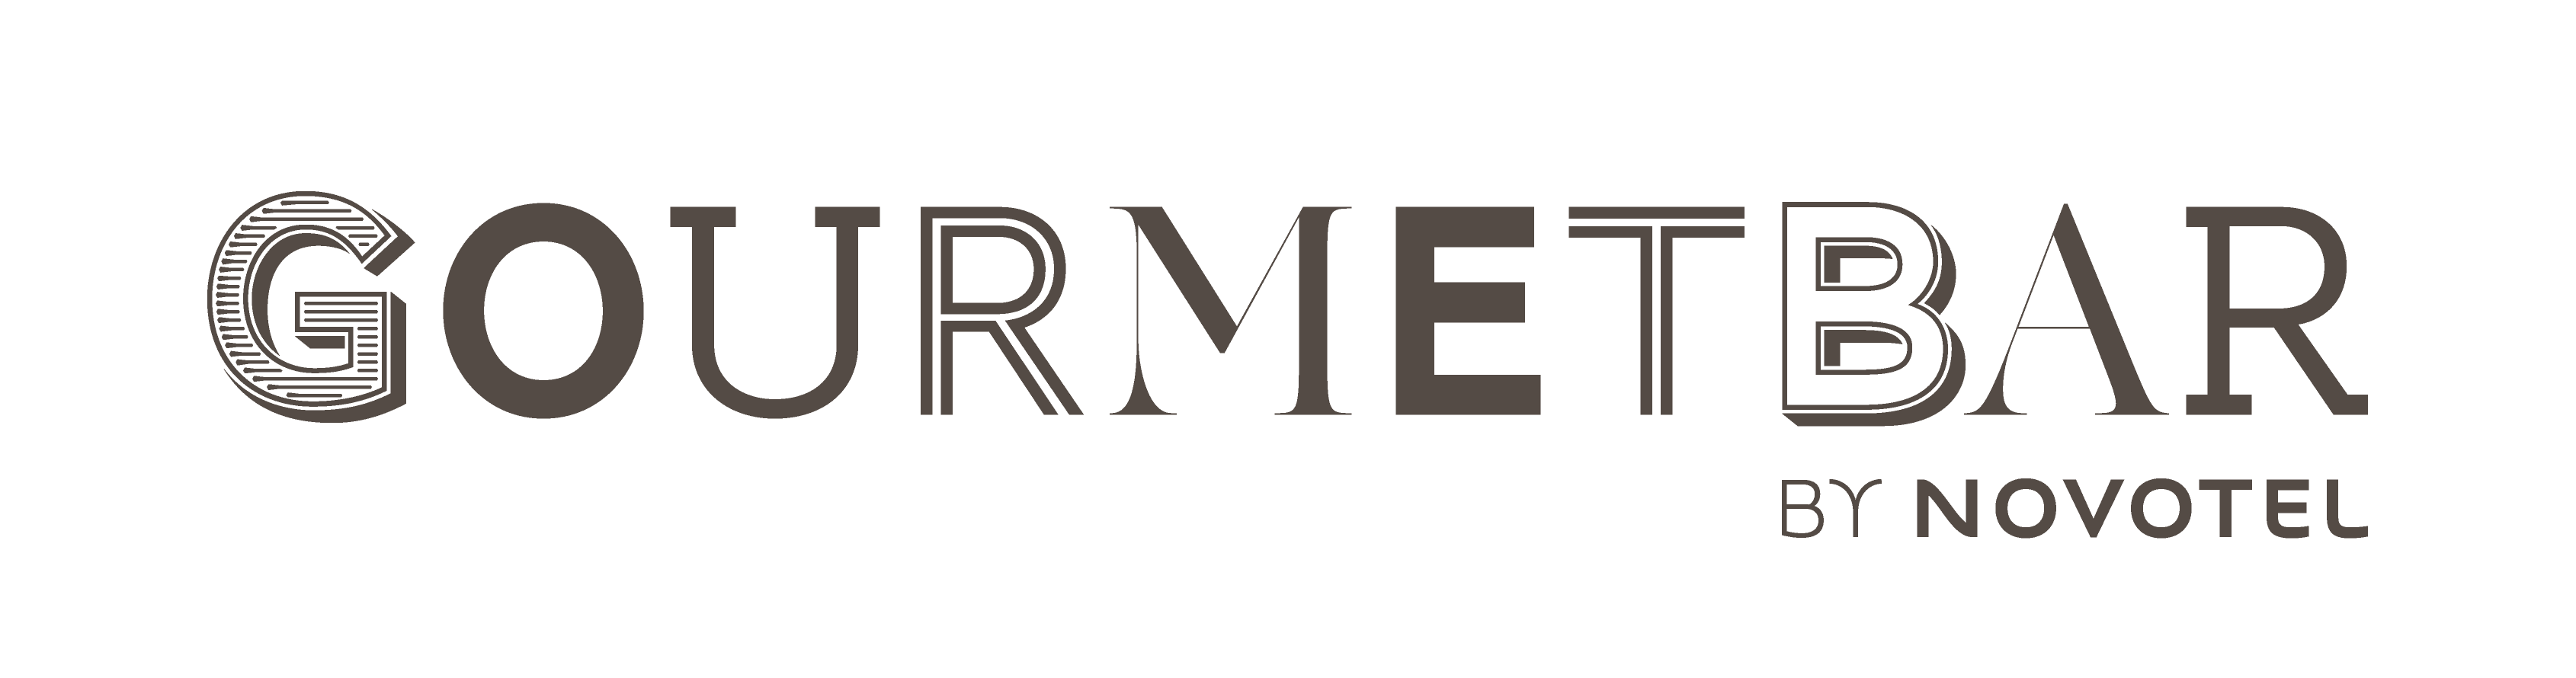 gourmet-bar